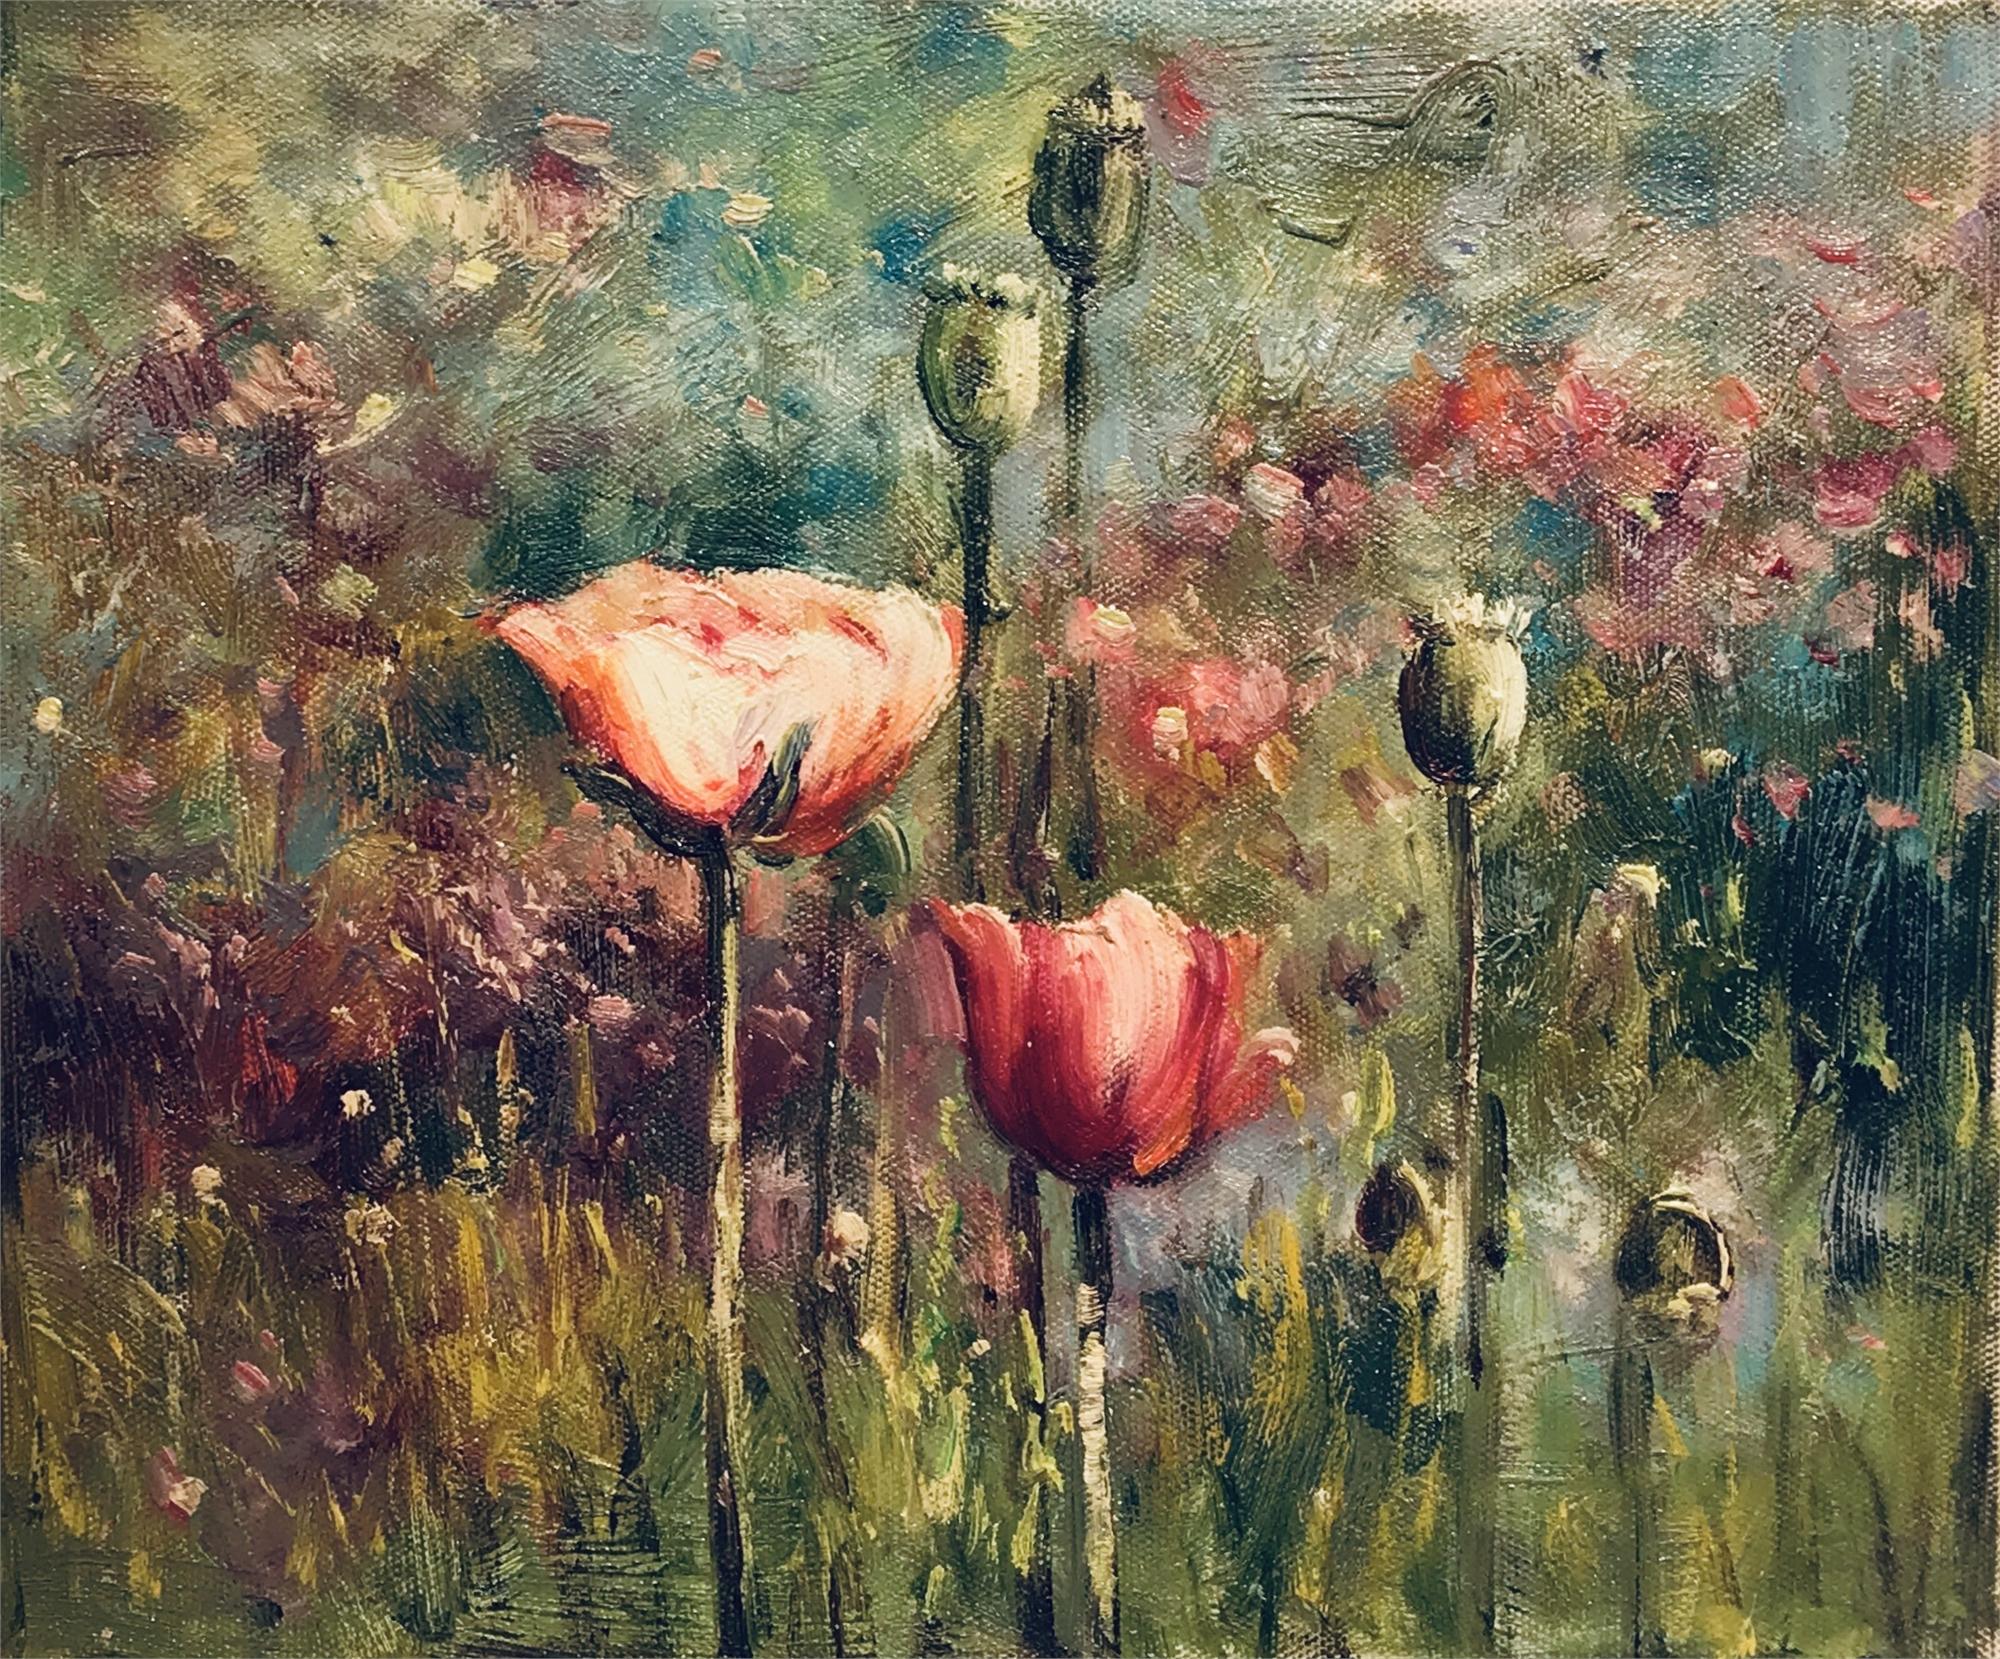 FLOWERS IN EARLY BLOOM by VARIOUS WORKS